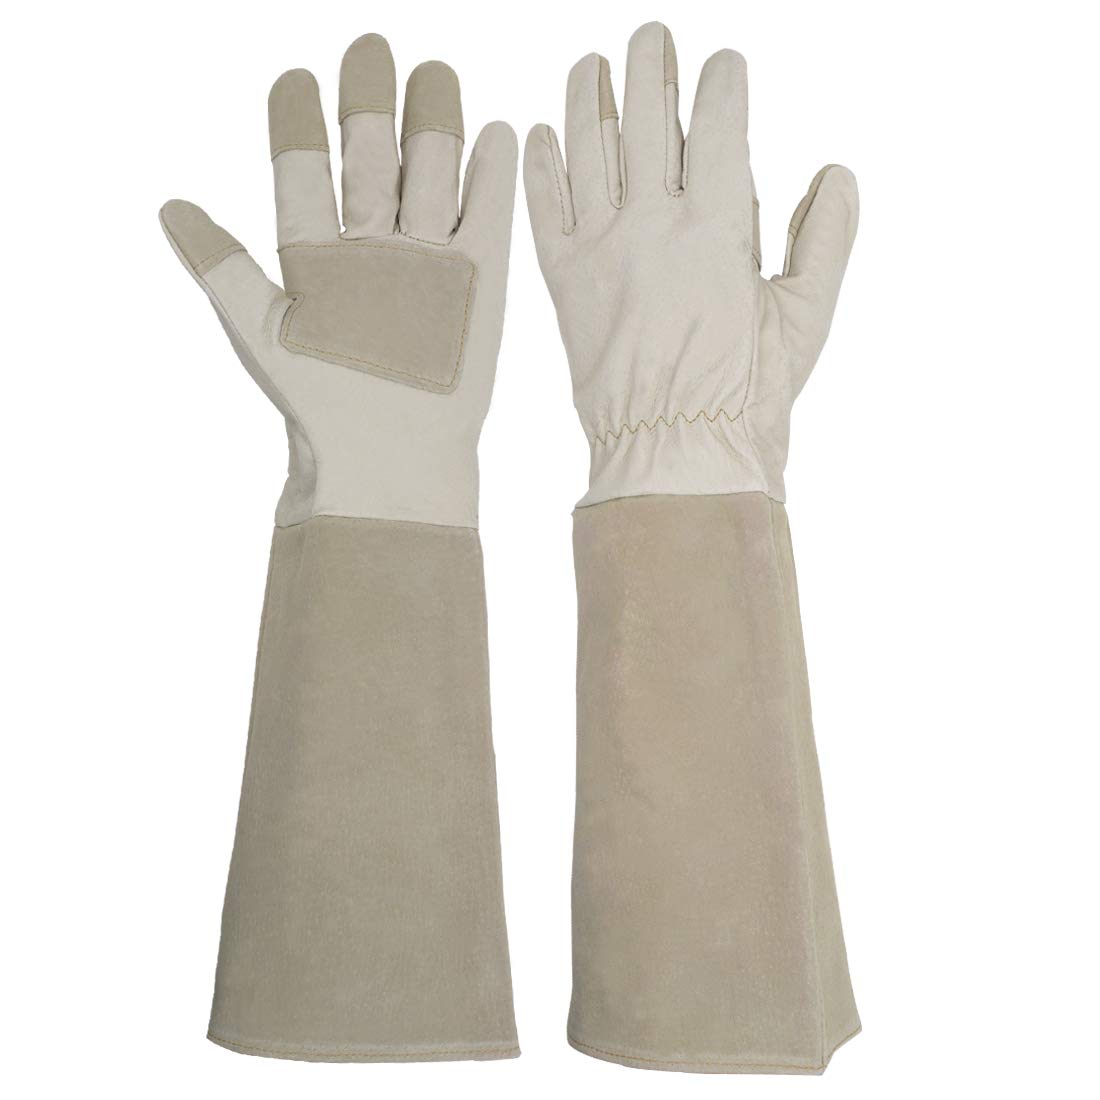 Long Sleeve Leather Gardening Gloves,Puncture resistant,Breathable Pigskin Leather Gauntlet,Rose Pruning Floral Gauntlet Garden Gloves For Women and Men (Medium, Beige)